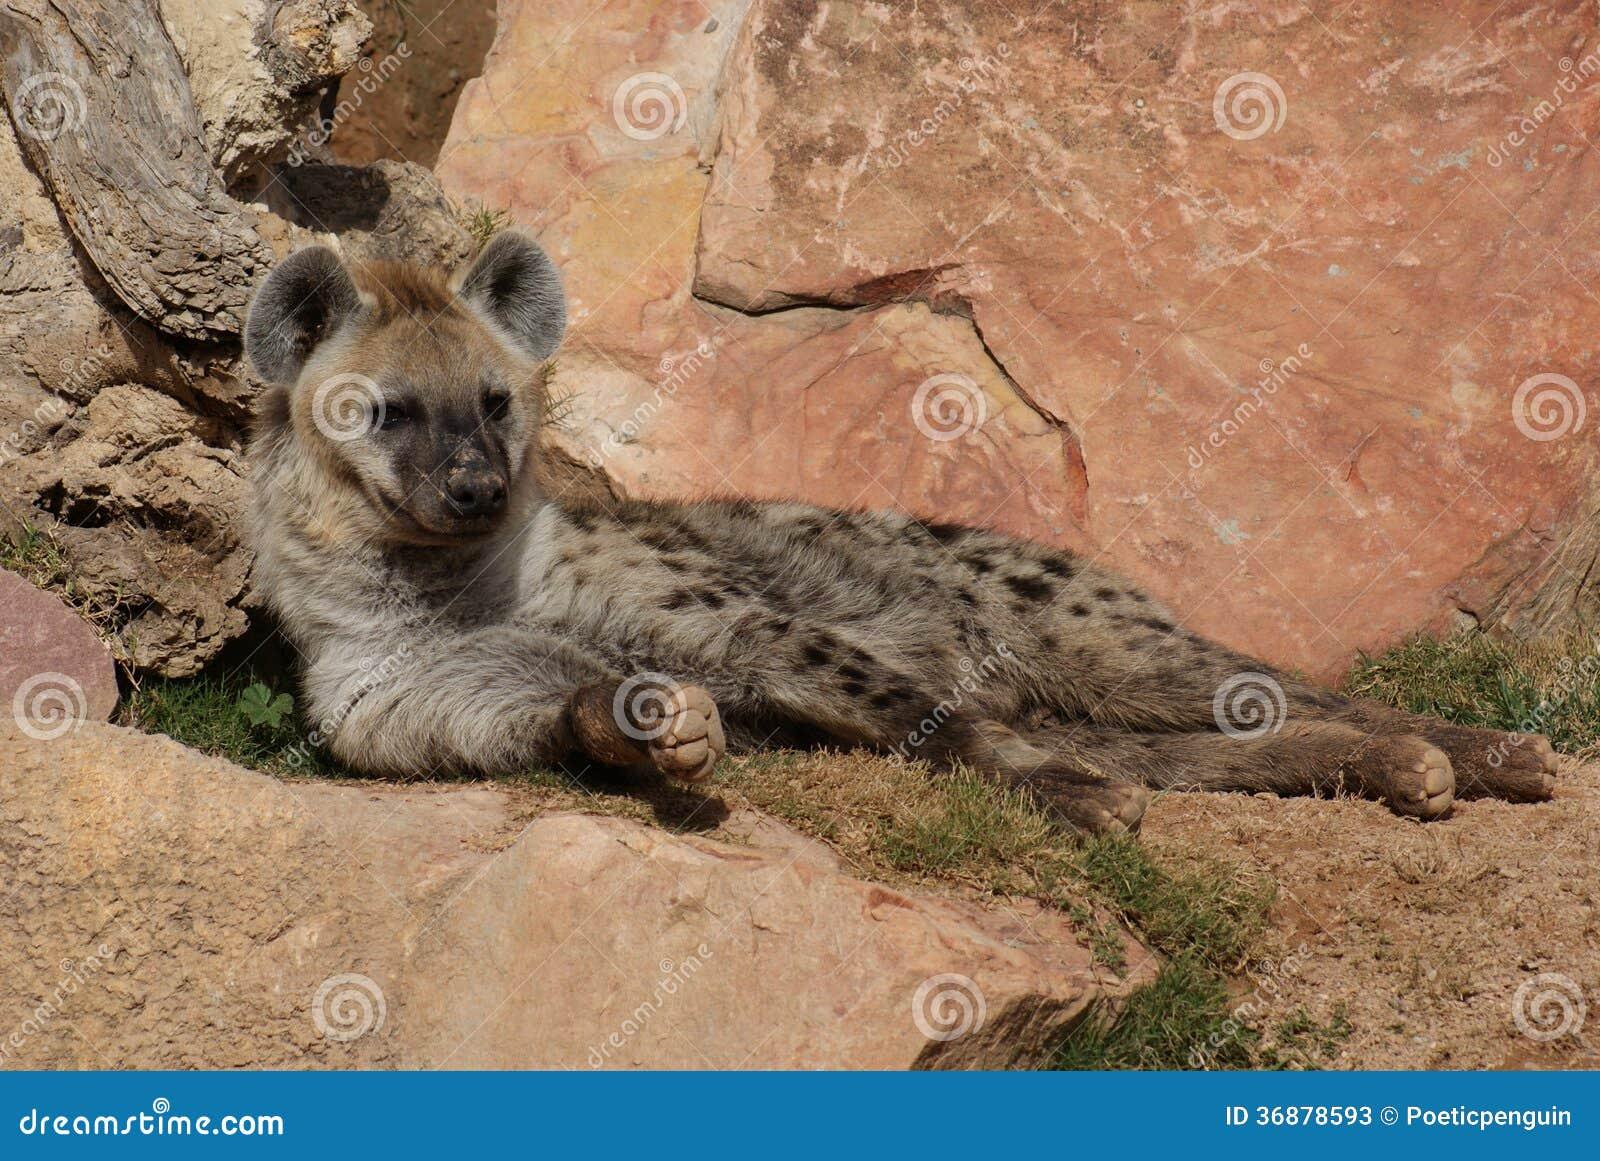 Download Iena (di Risata) Macchiata - Crocuta Del Crocuta Immagine Stock - Immagine di cane, africano: 36878593